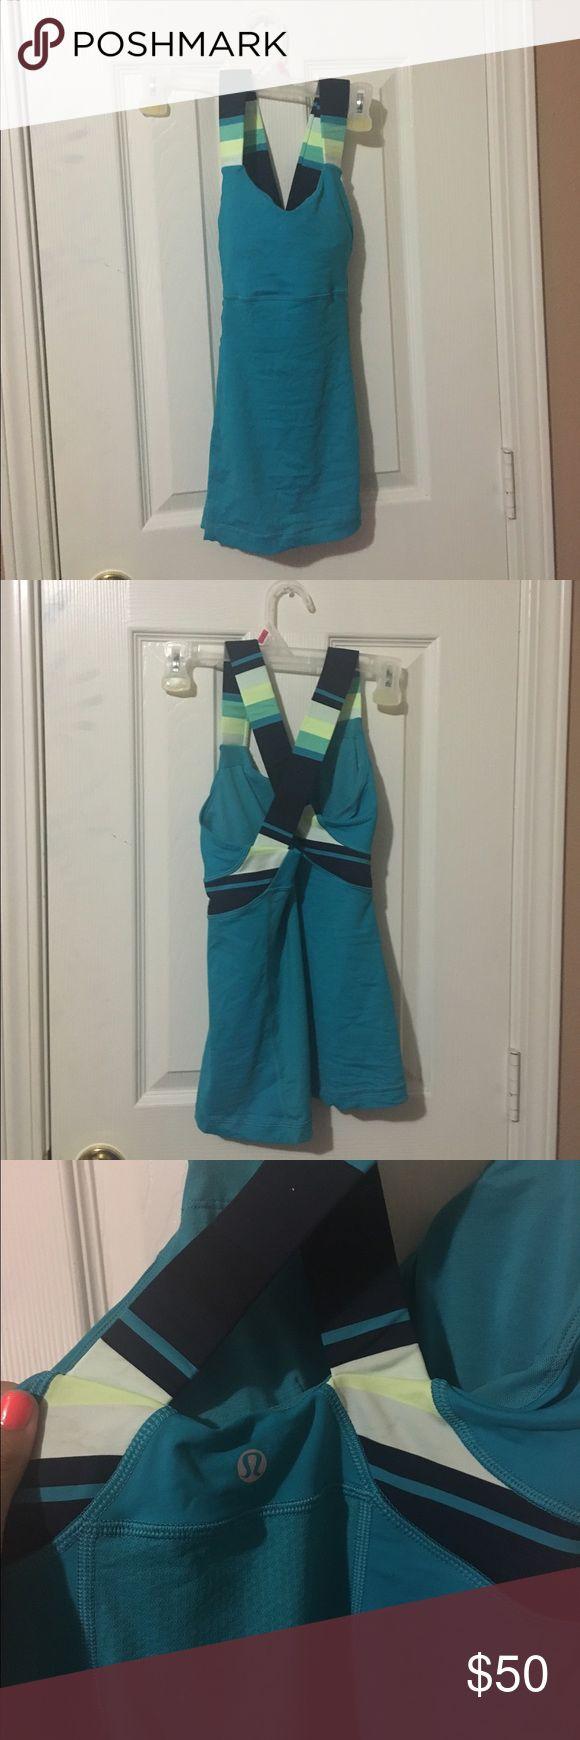 NWOT blue and green lulu lemon shirt Blue, green, and yellow lulu lemon shirt NEW WITH OUT TAG lululemon athletica Tops